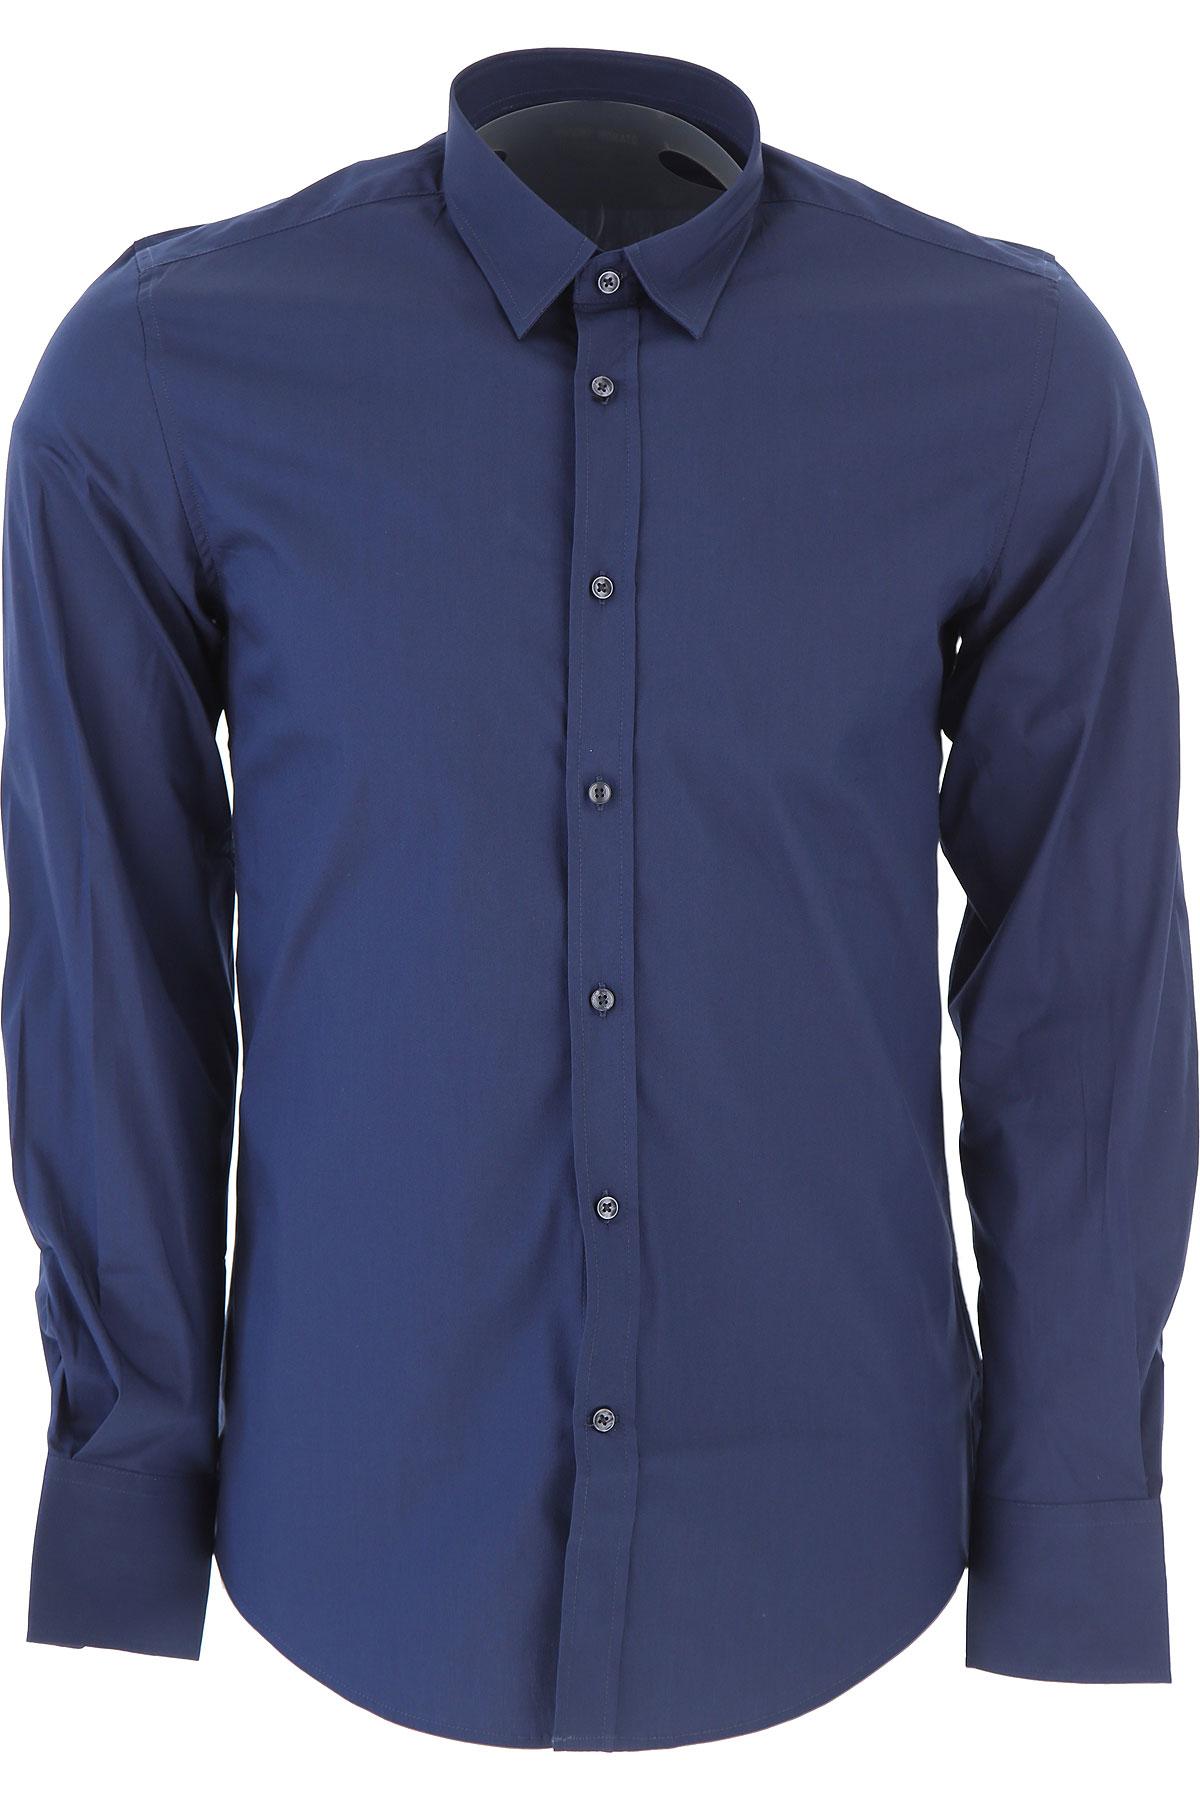 Image of Antony Morato Shirt for Men, Avio Blue, Cotton, 2017, L M S XL XS XXL